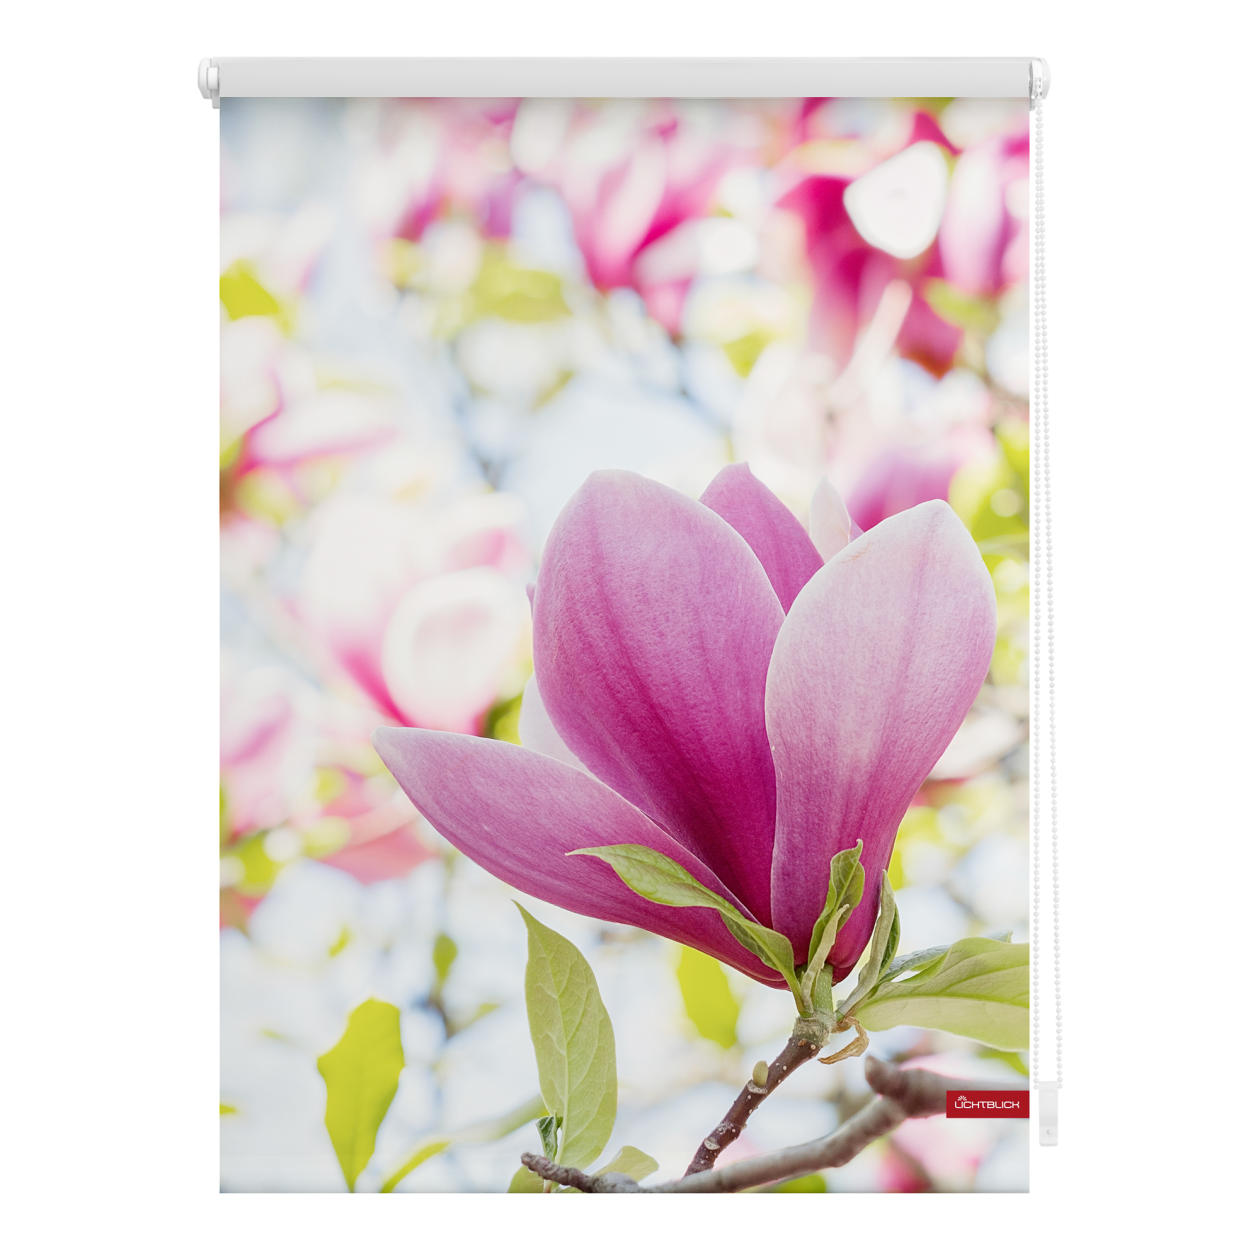 rollo klemmfix ohne bohren blickdicht magnolie rosa. Black Bedroom Furniture Sets. Home Design Ideas